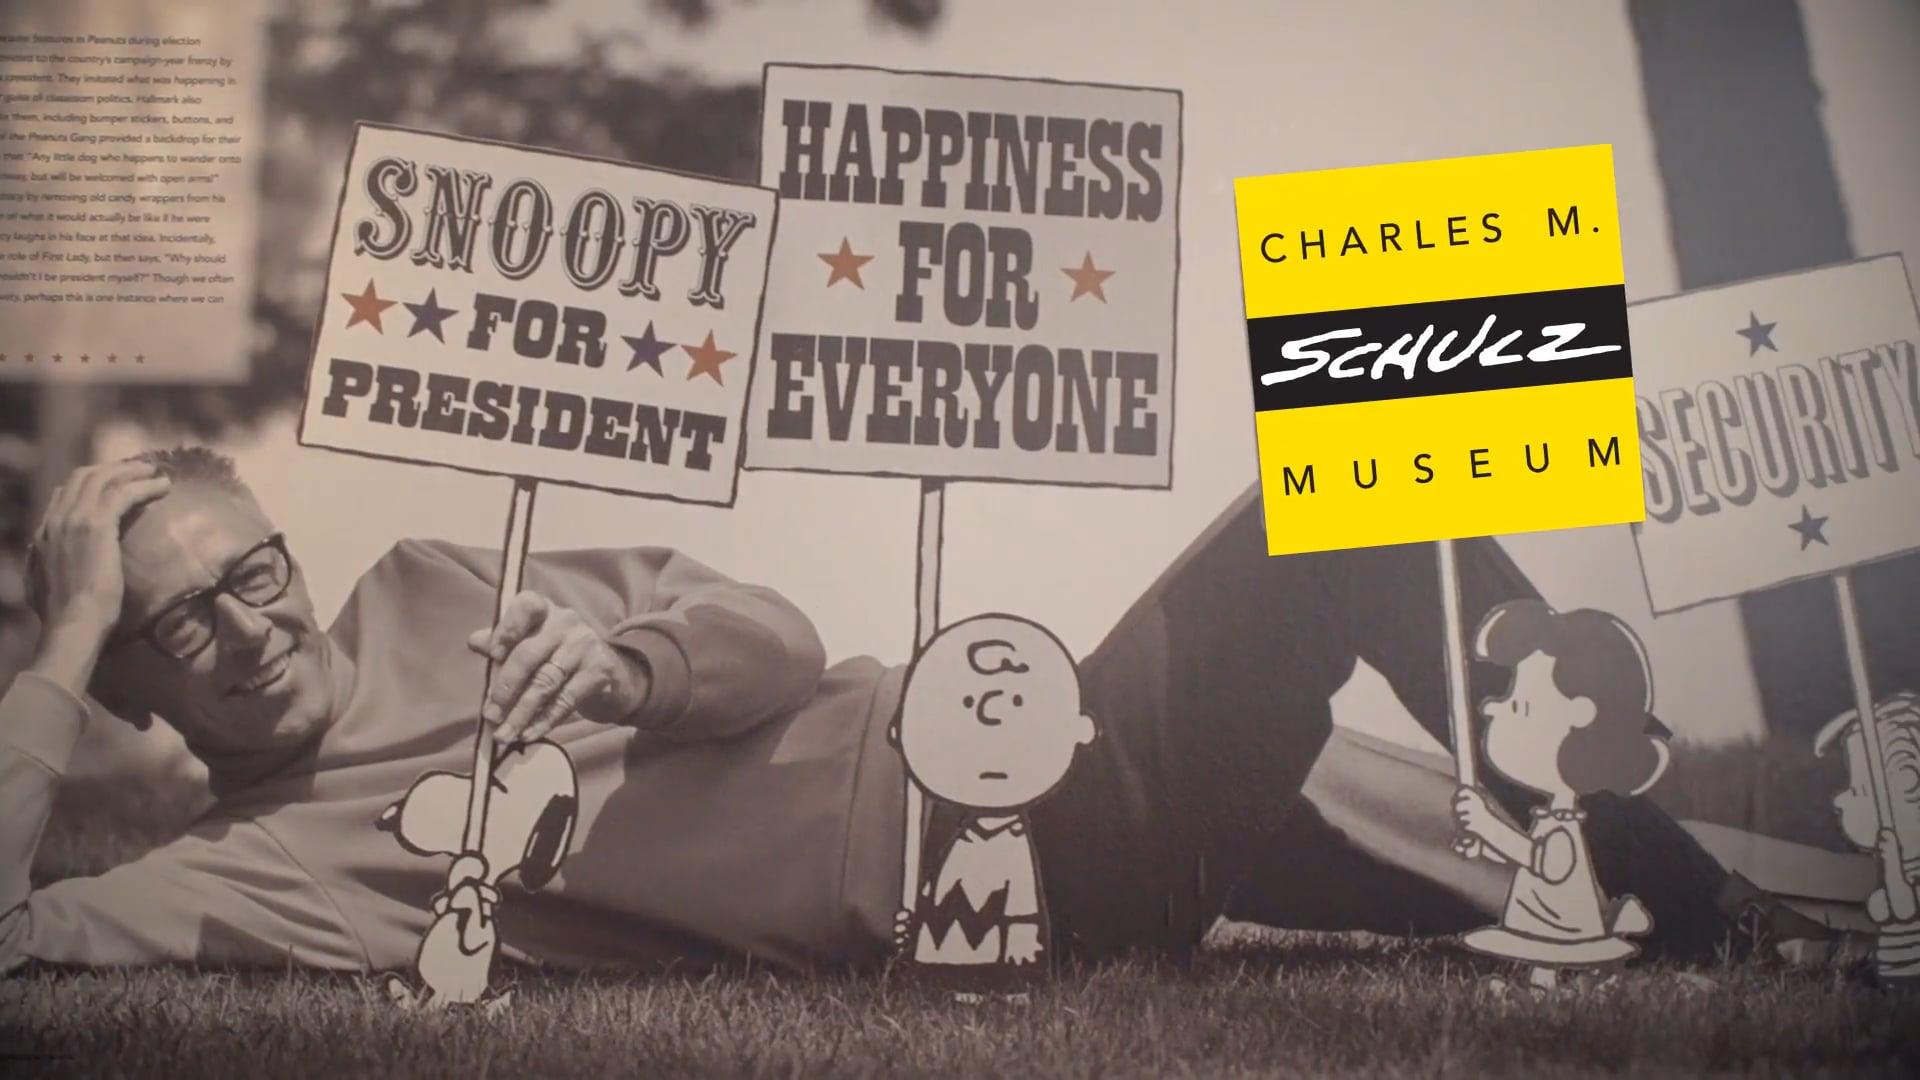 Mr Schulz goes to Washington